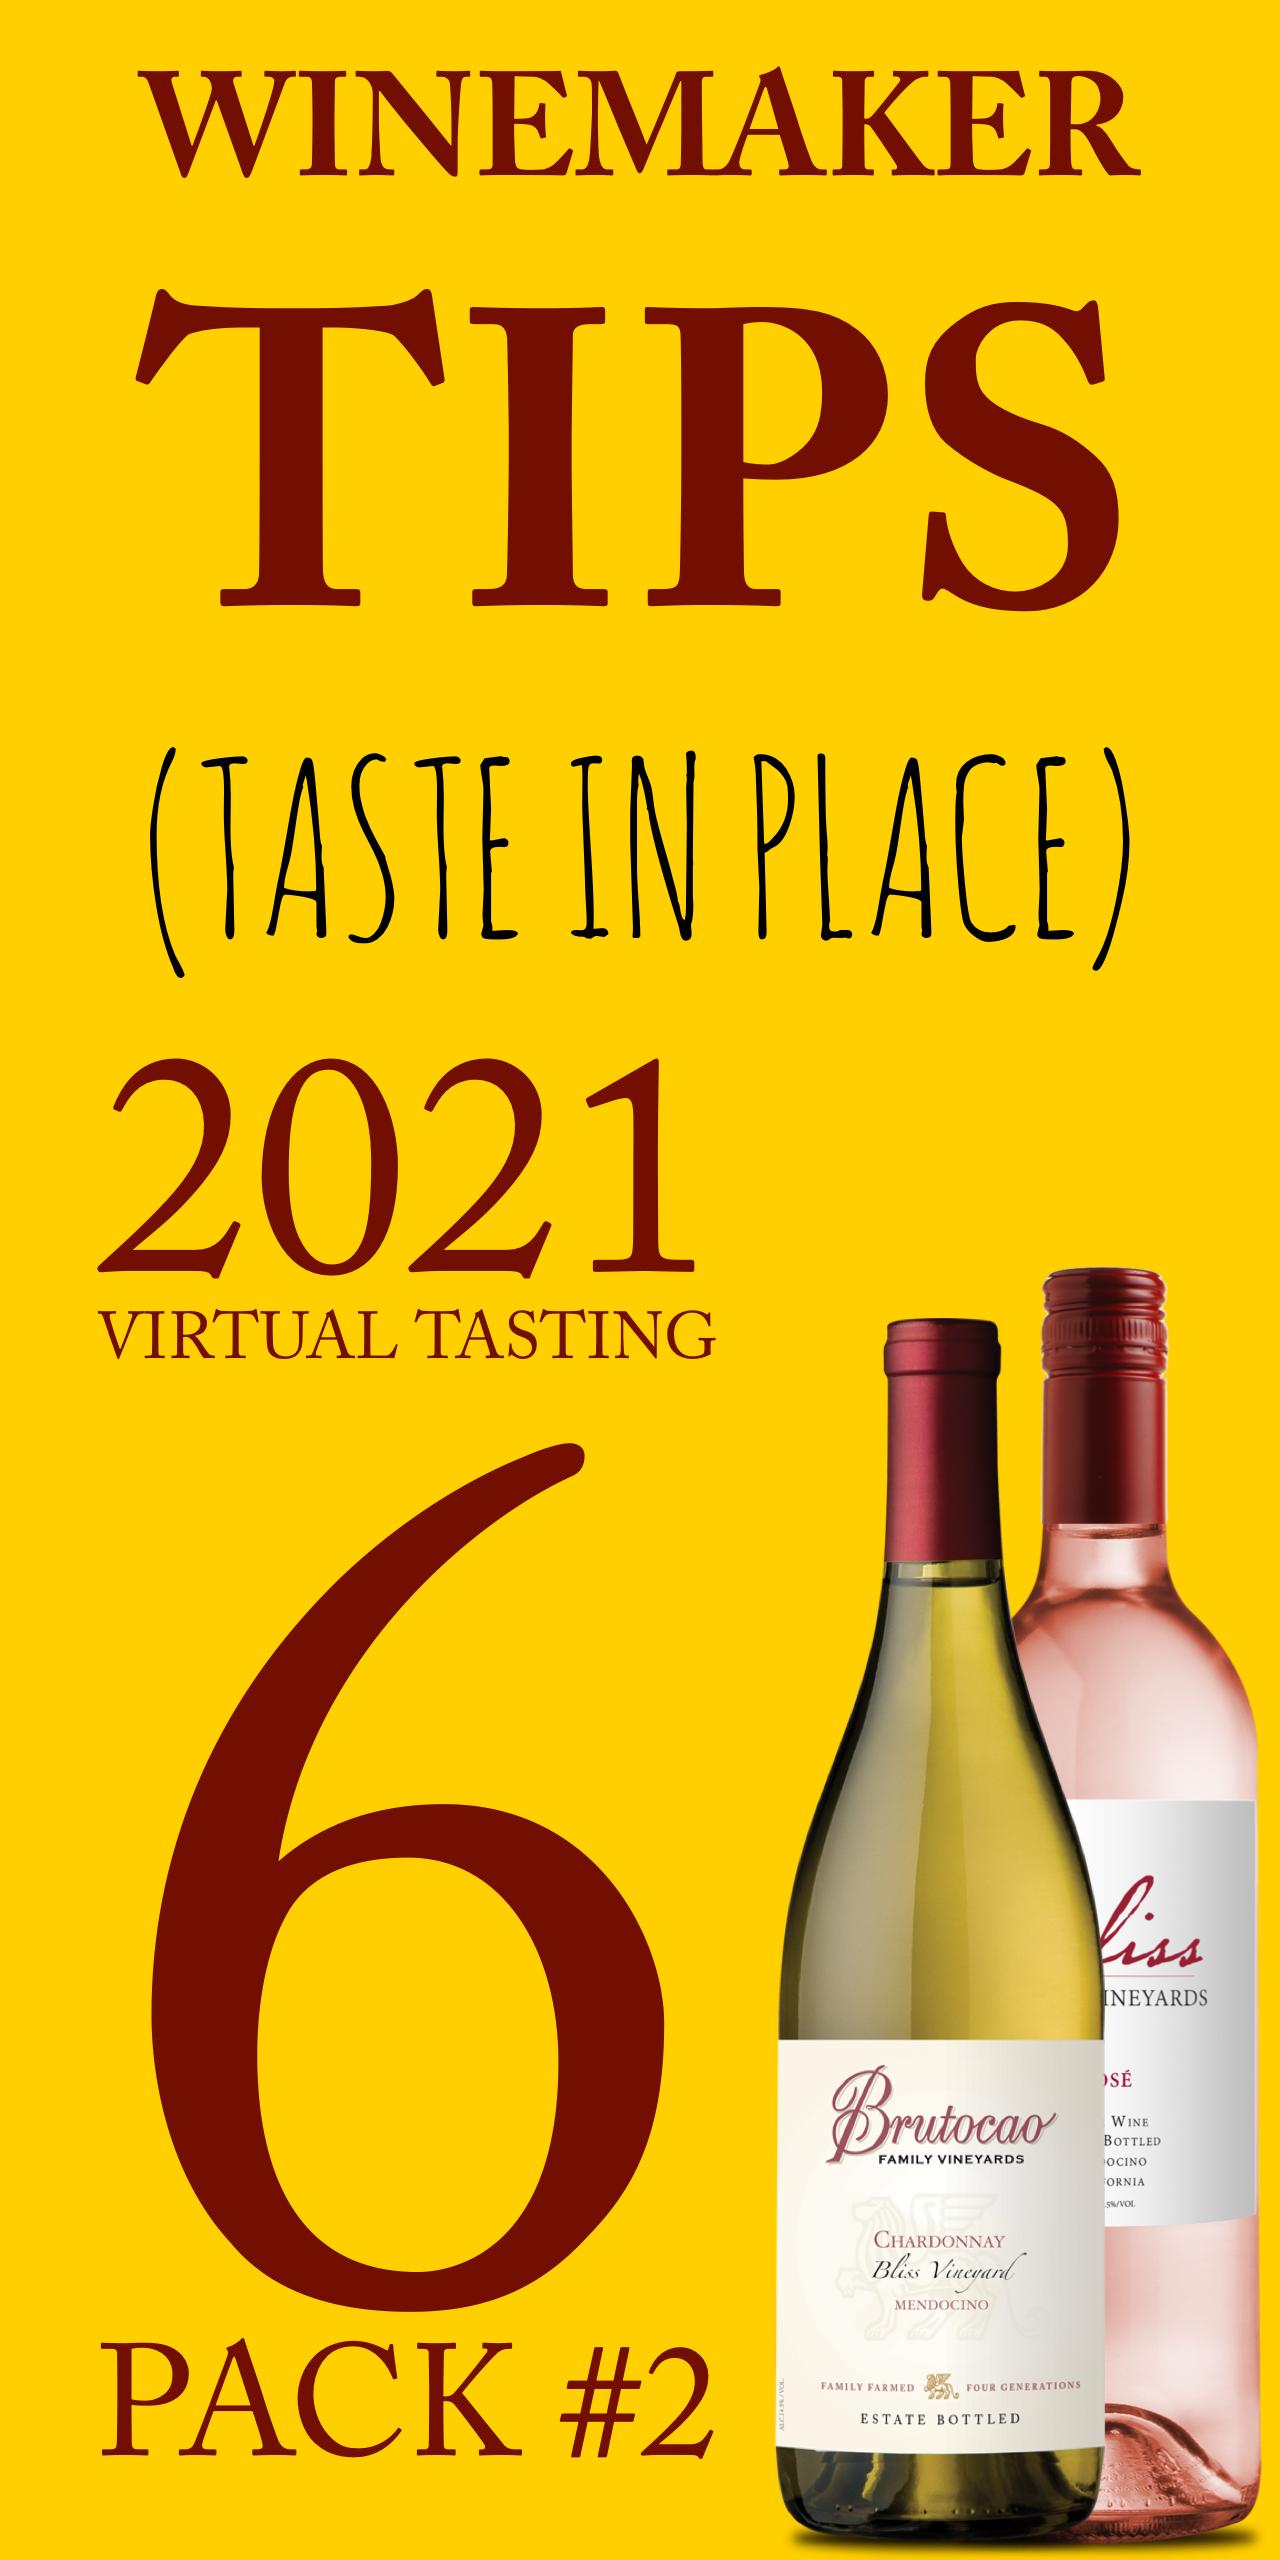 2021 Virtual Tasting 6 pack #2 (6x750ml)